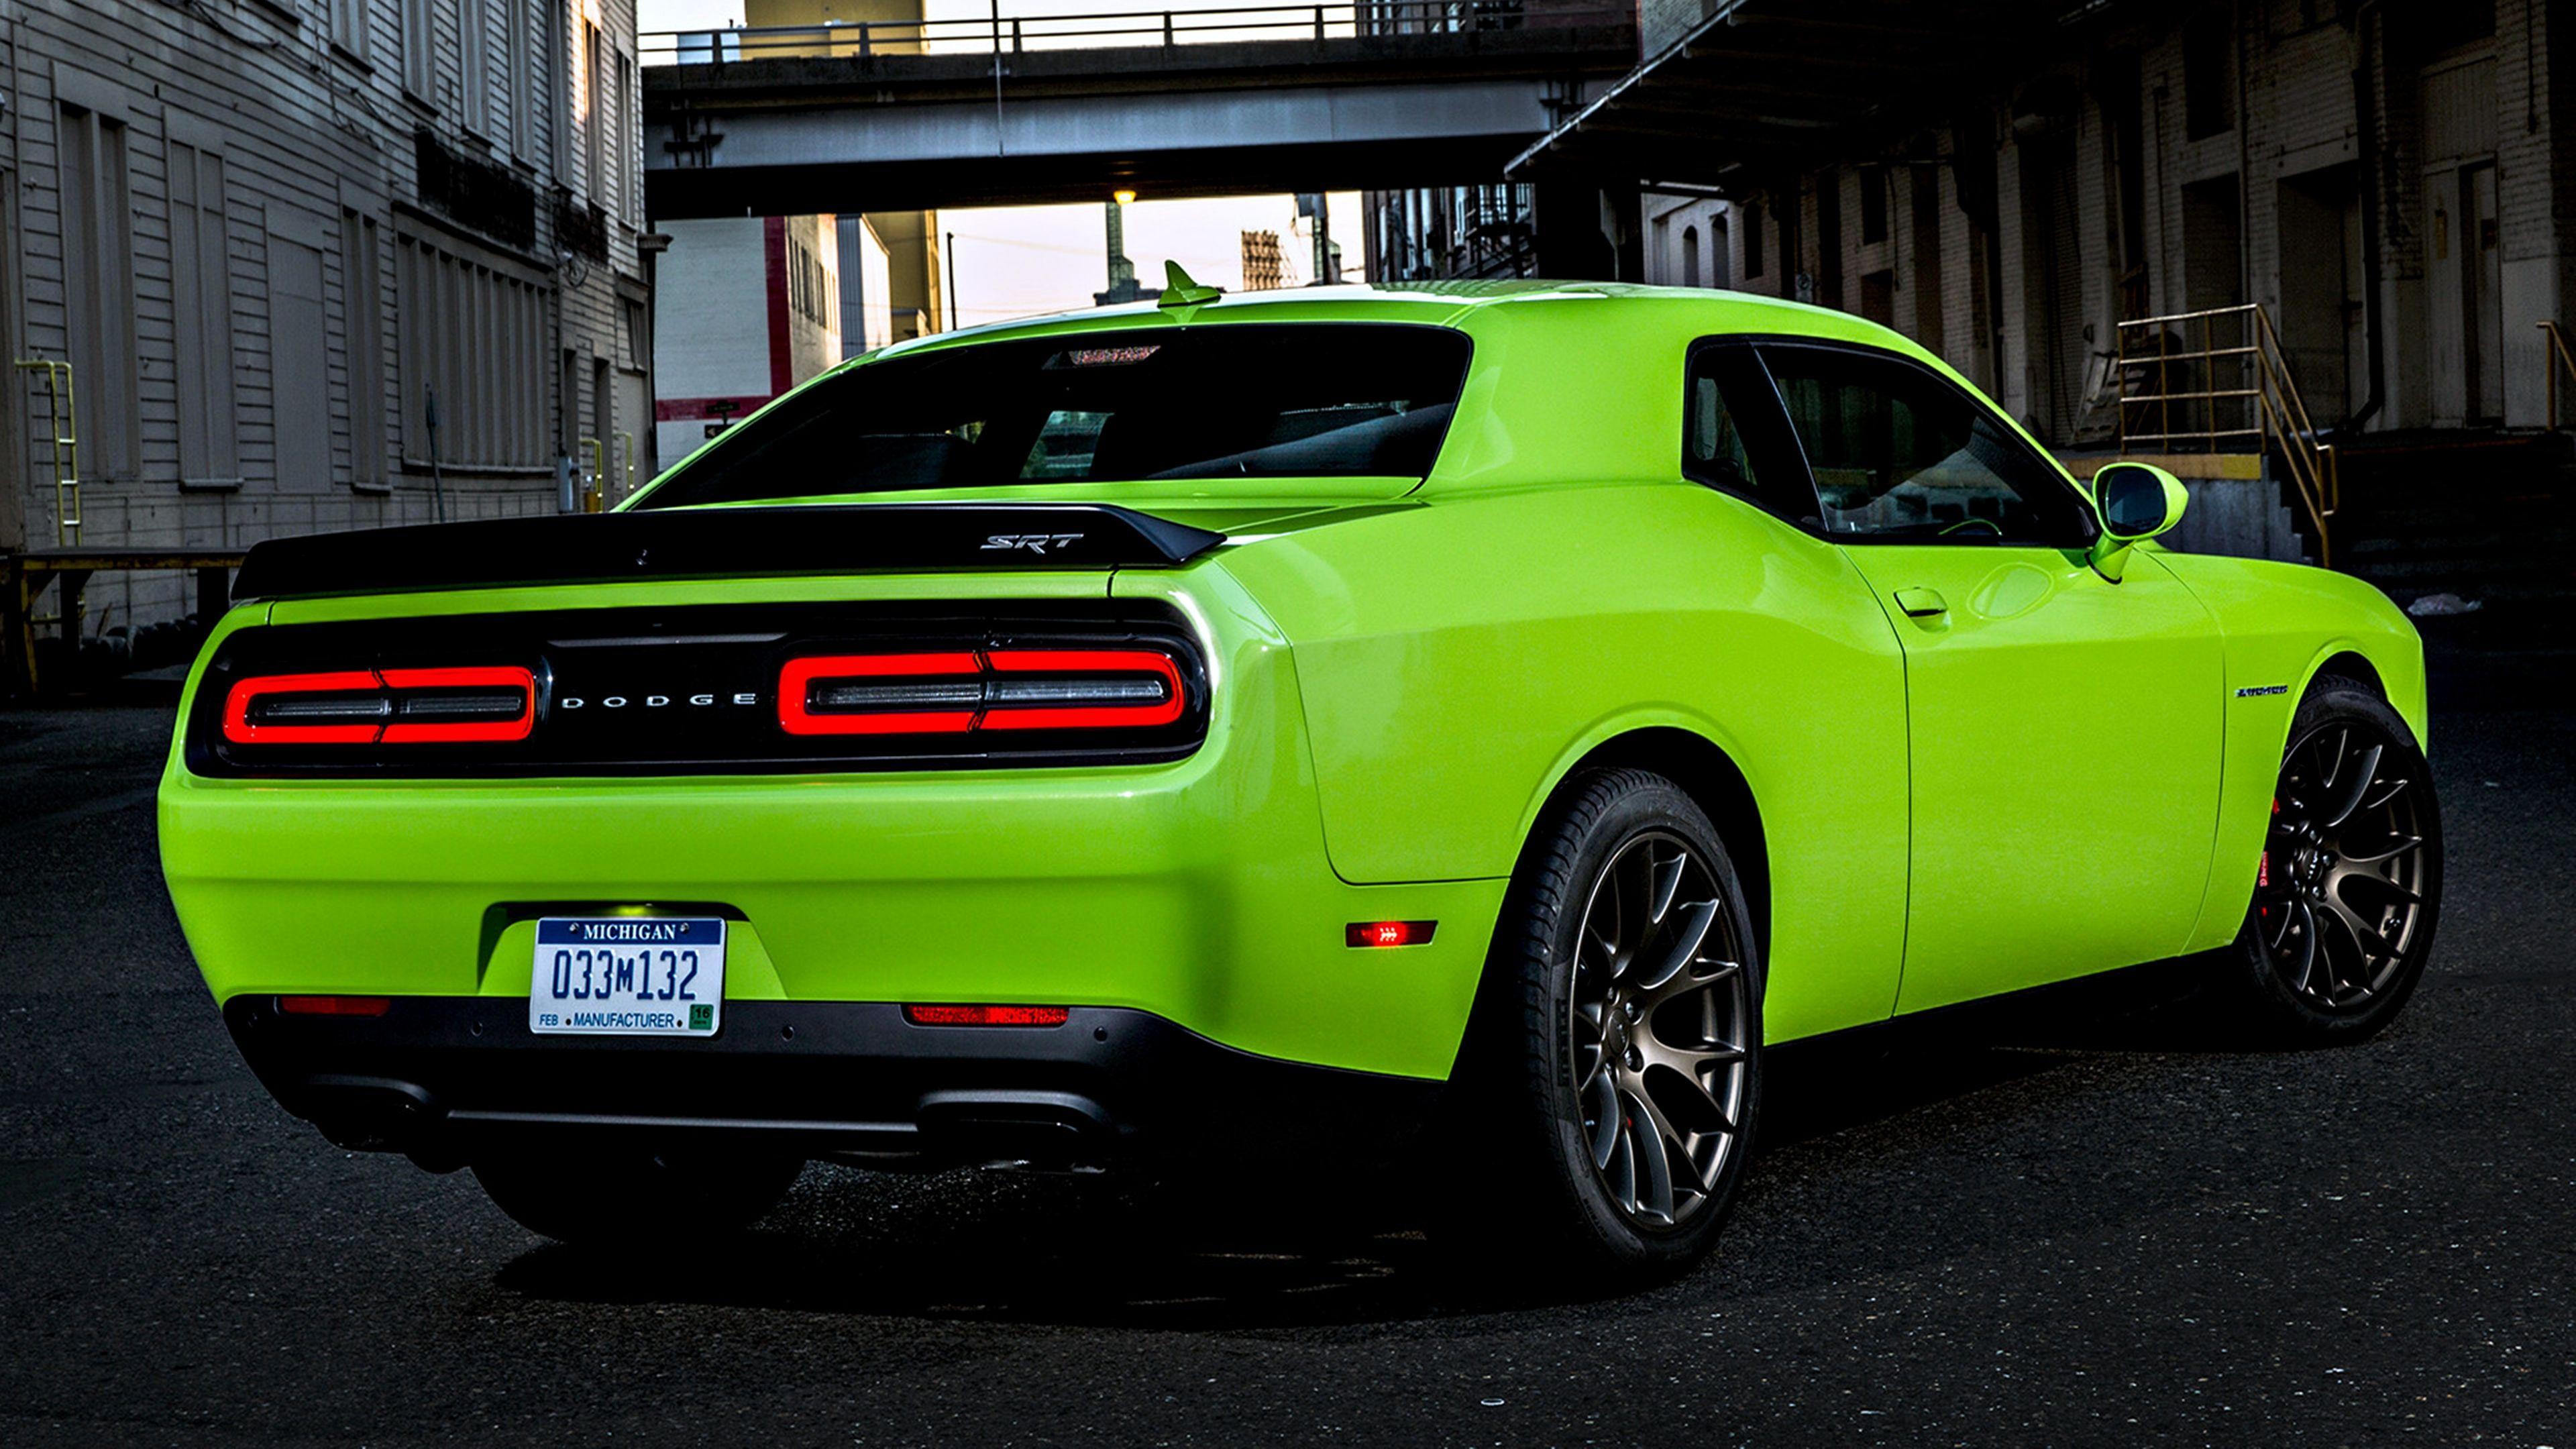 Dodge 4K Wallpapers - Top Free Dodge 4K Backgrounds ...